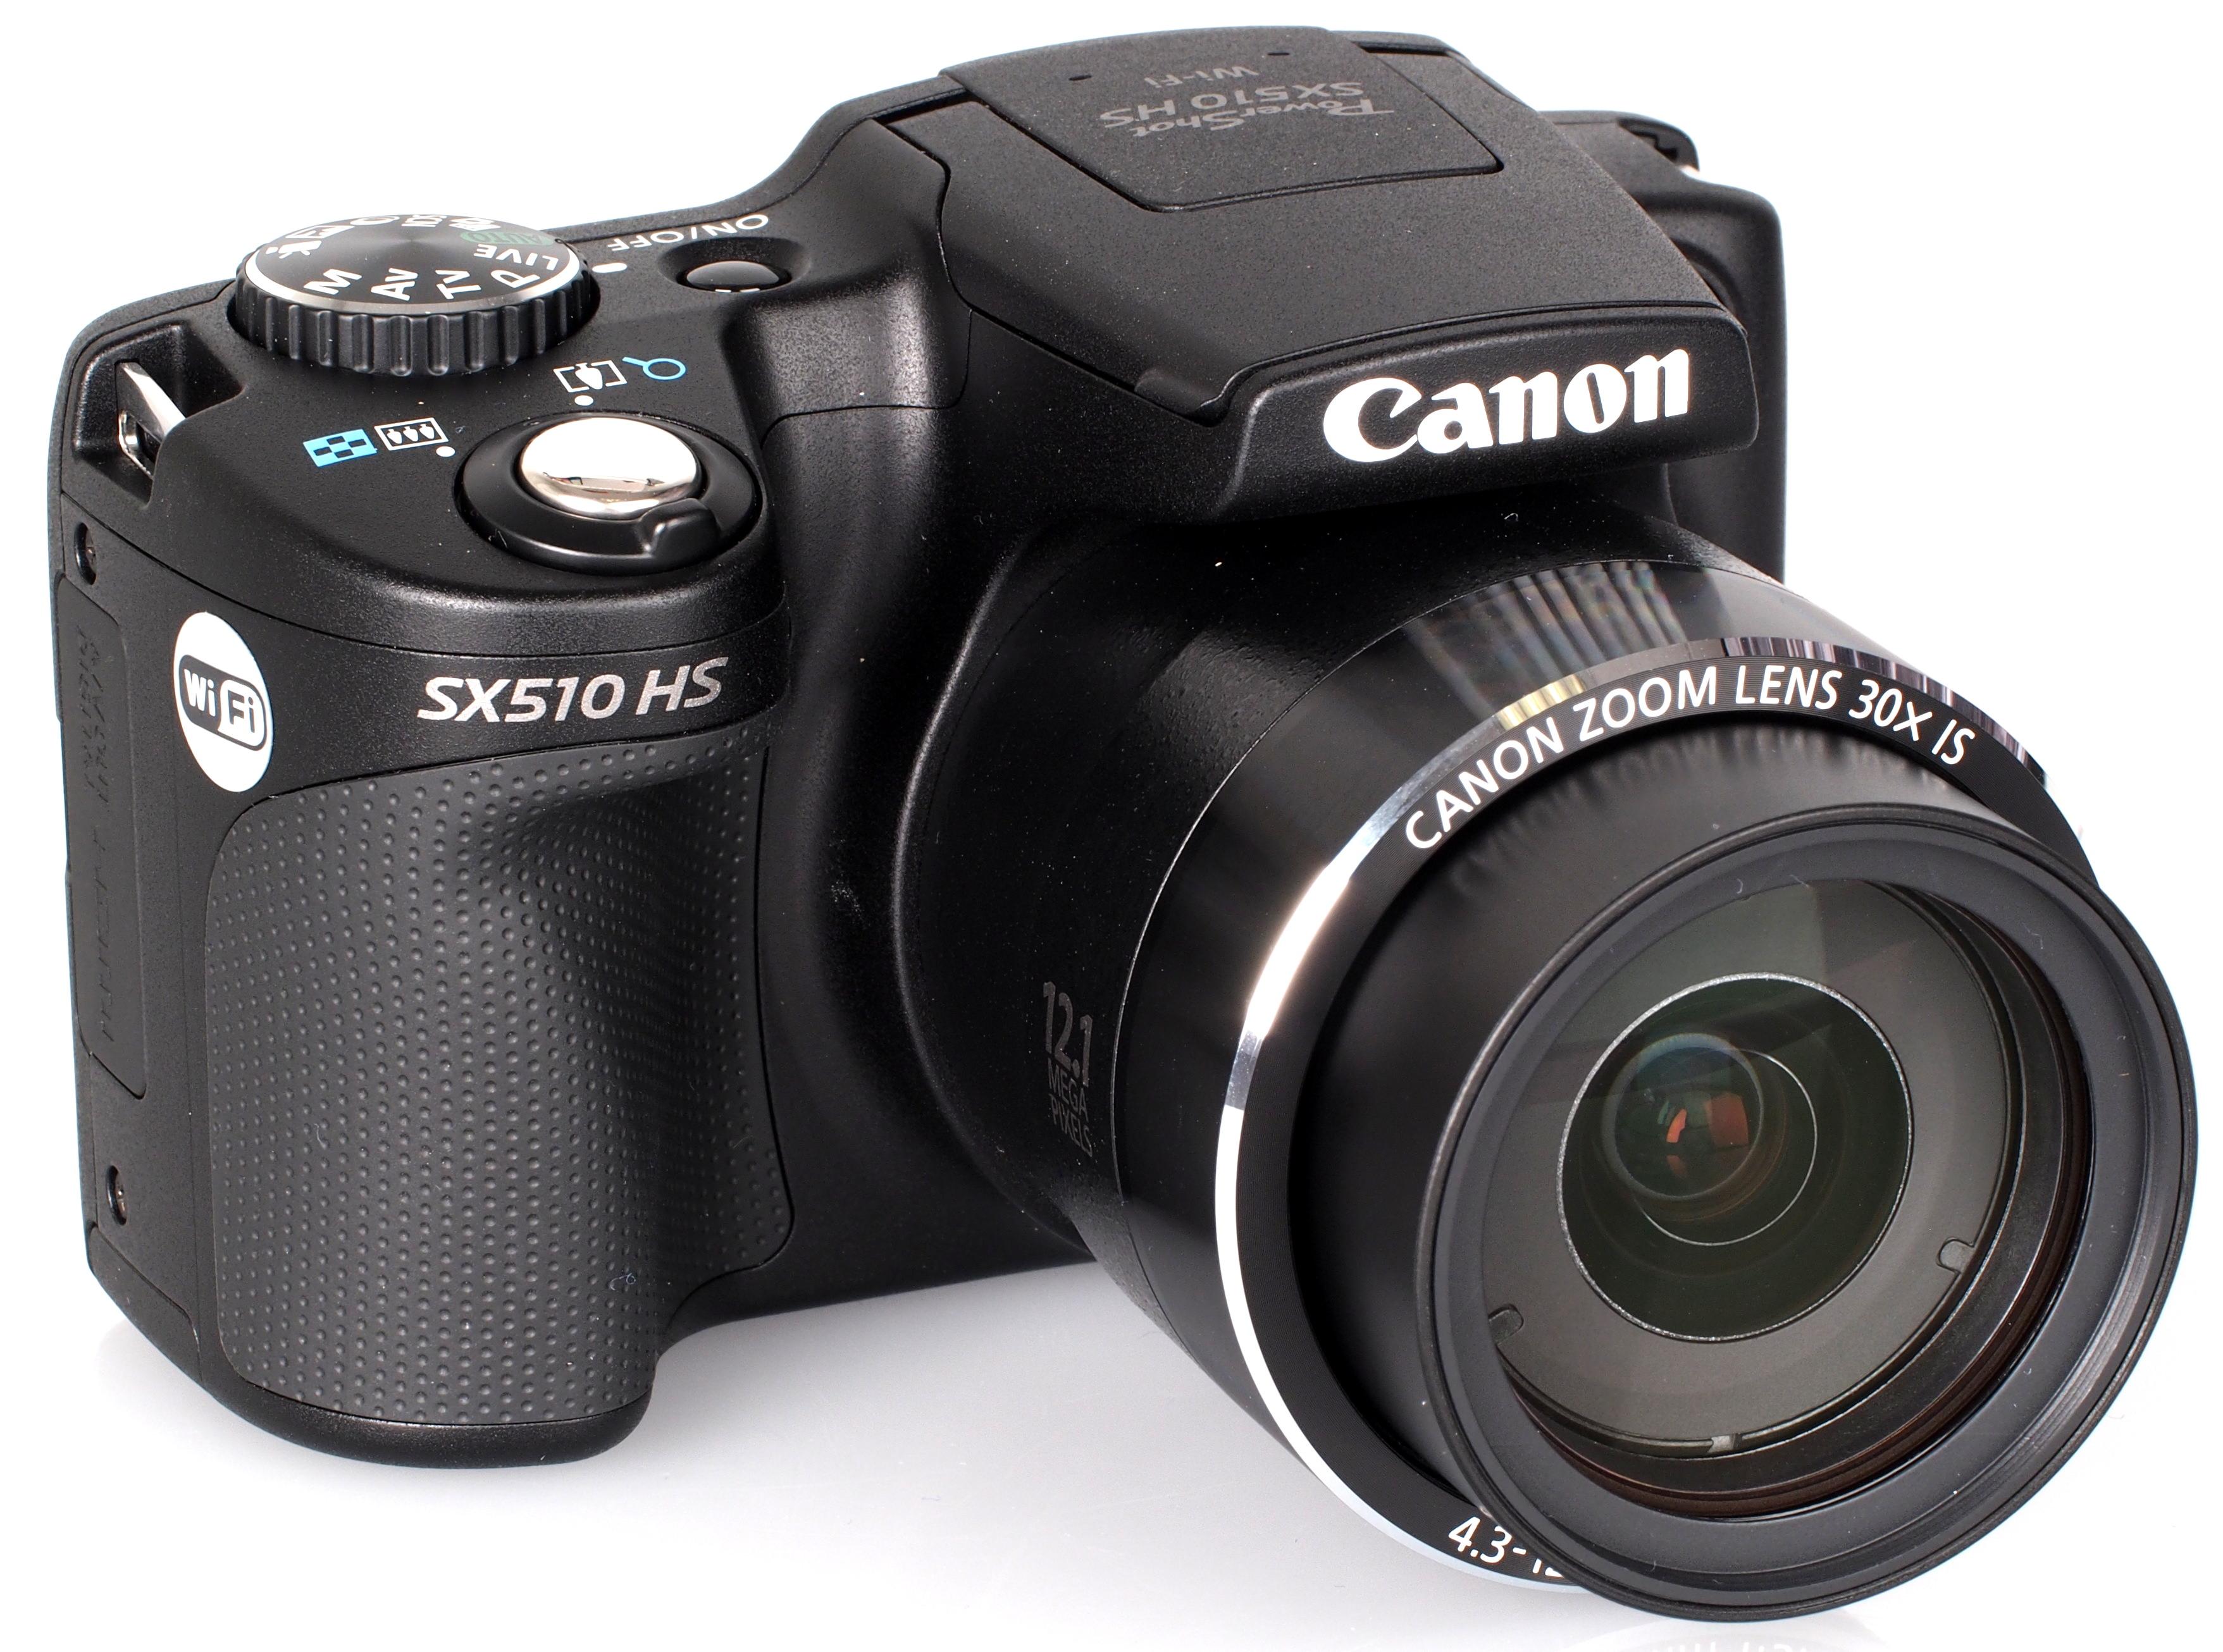 Canon Powershot SX510 HS Sample Photos